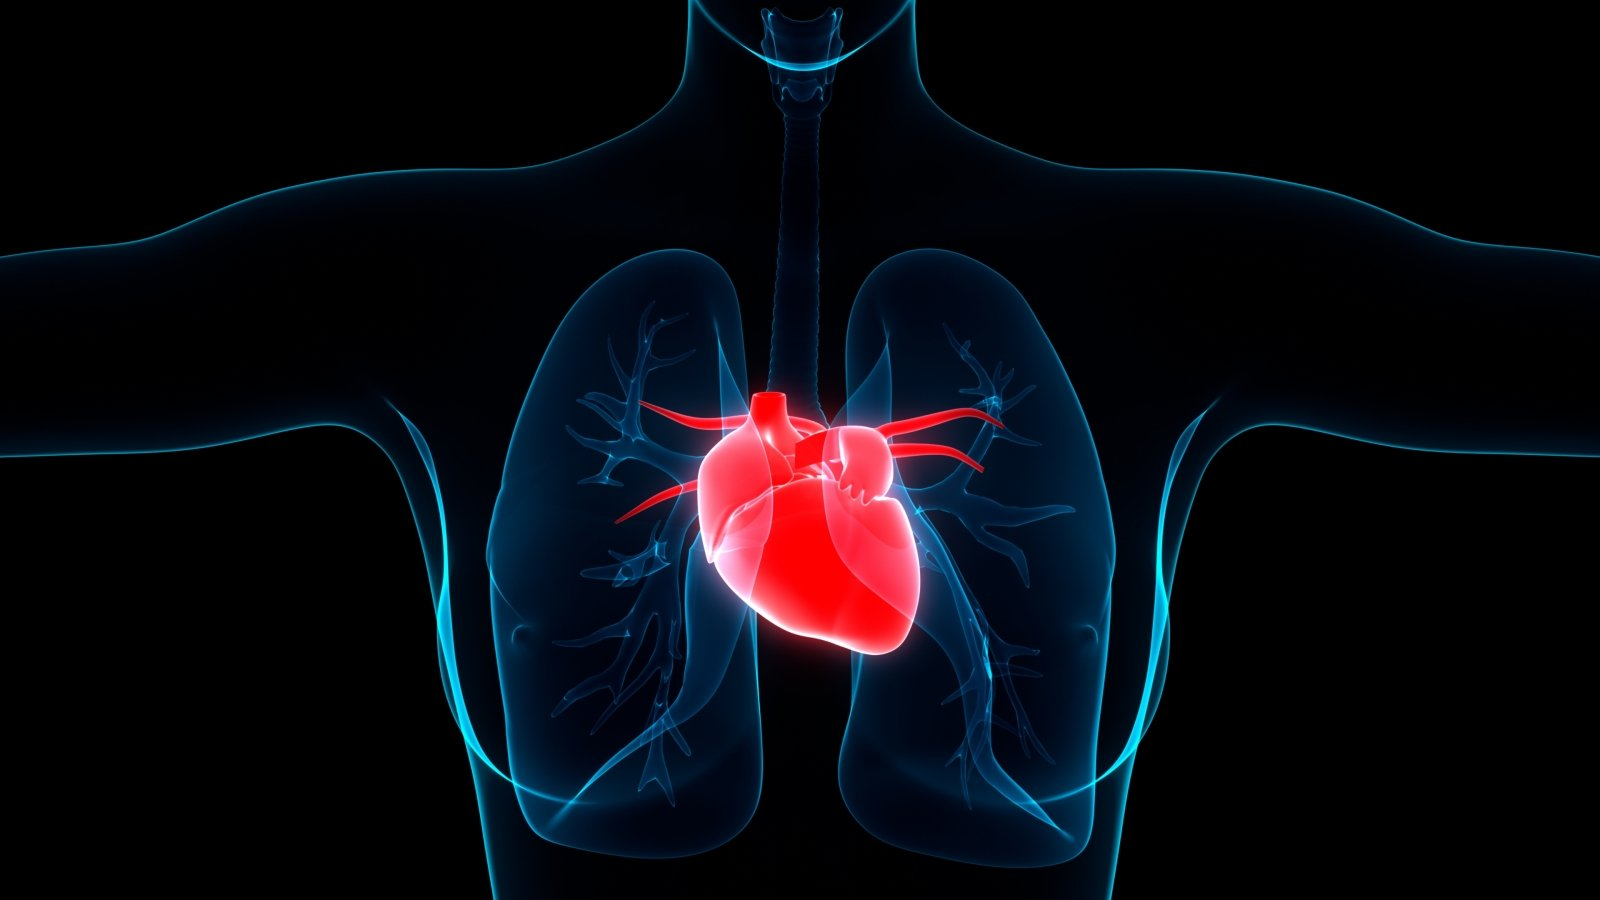 vitamino 400 TV širdies sveikata